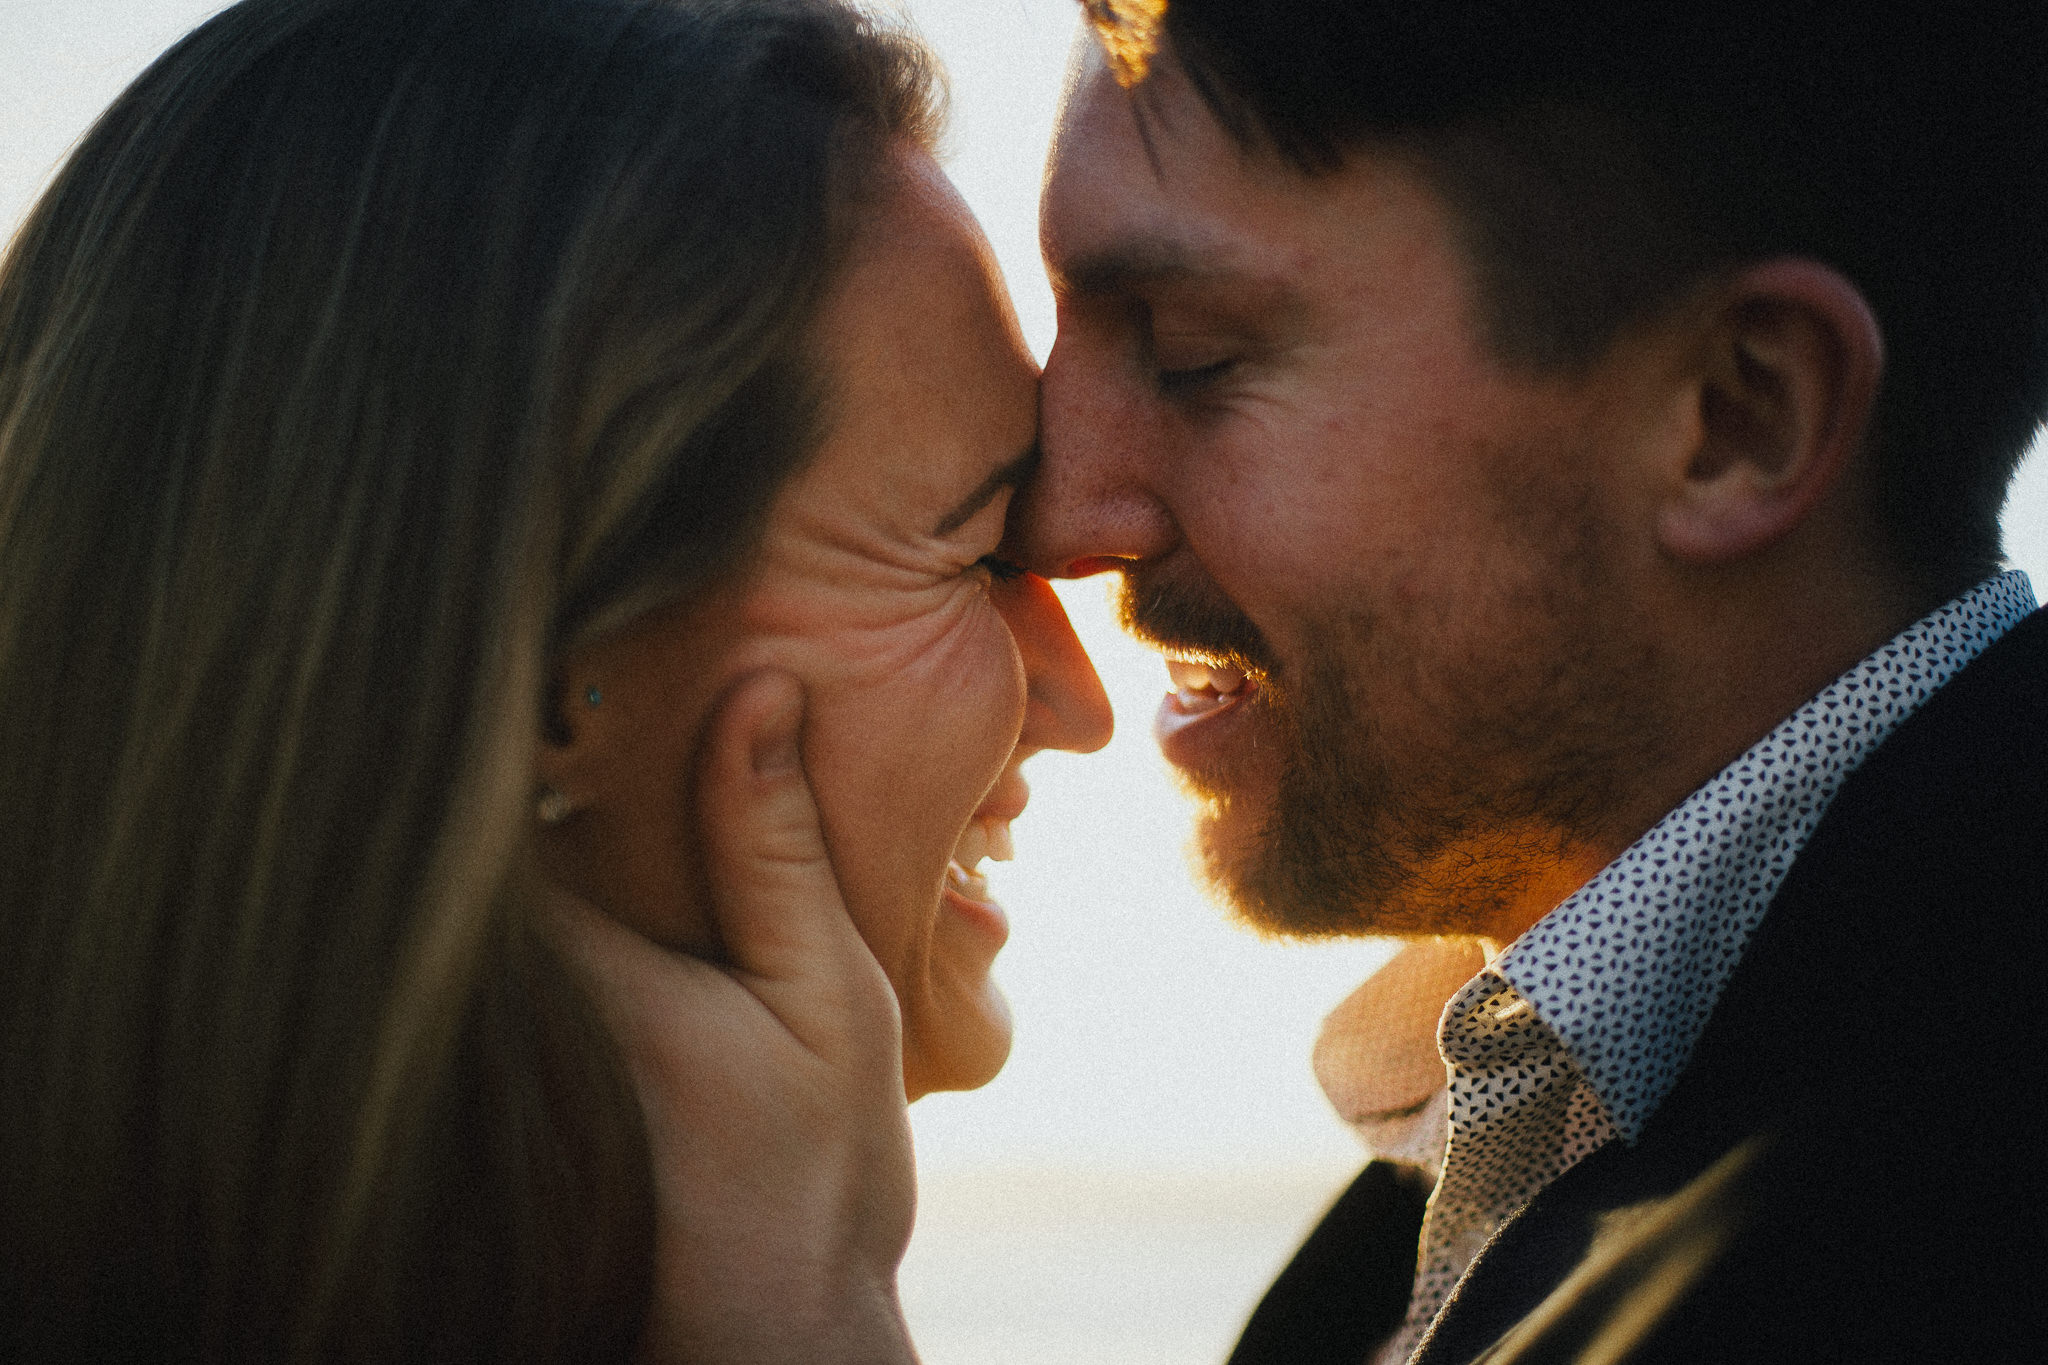 Archer Inspired Photography Carmel Beach California Wedding Engagement Lifestyle Anniversary Natural Light Photographer-25.jpg